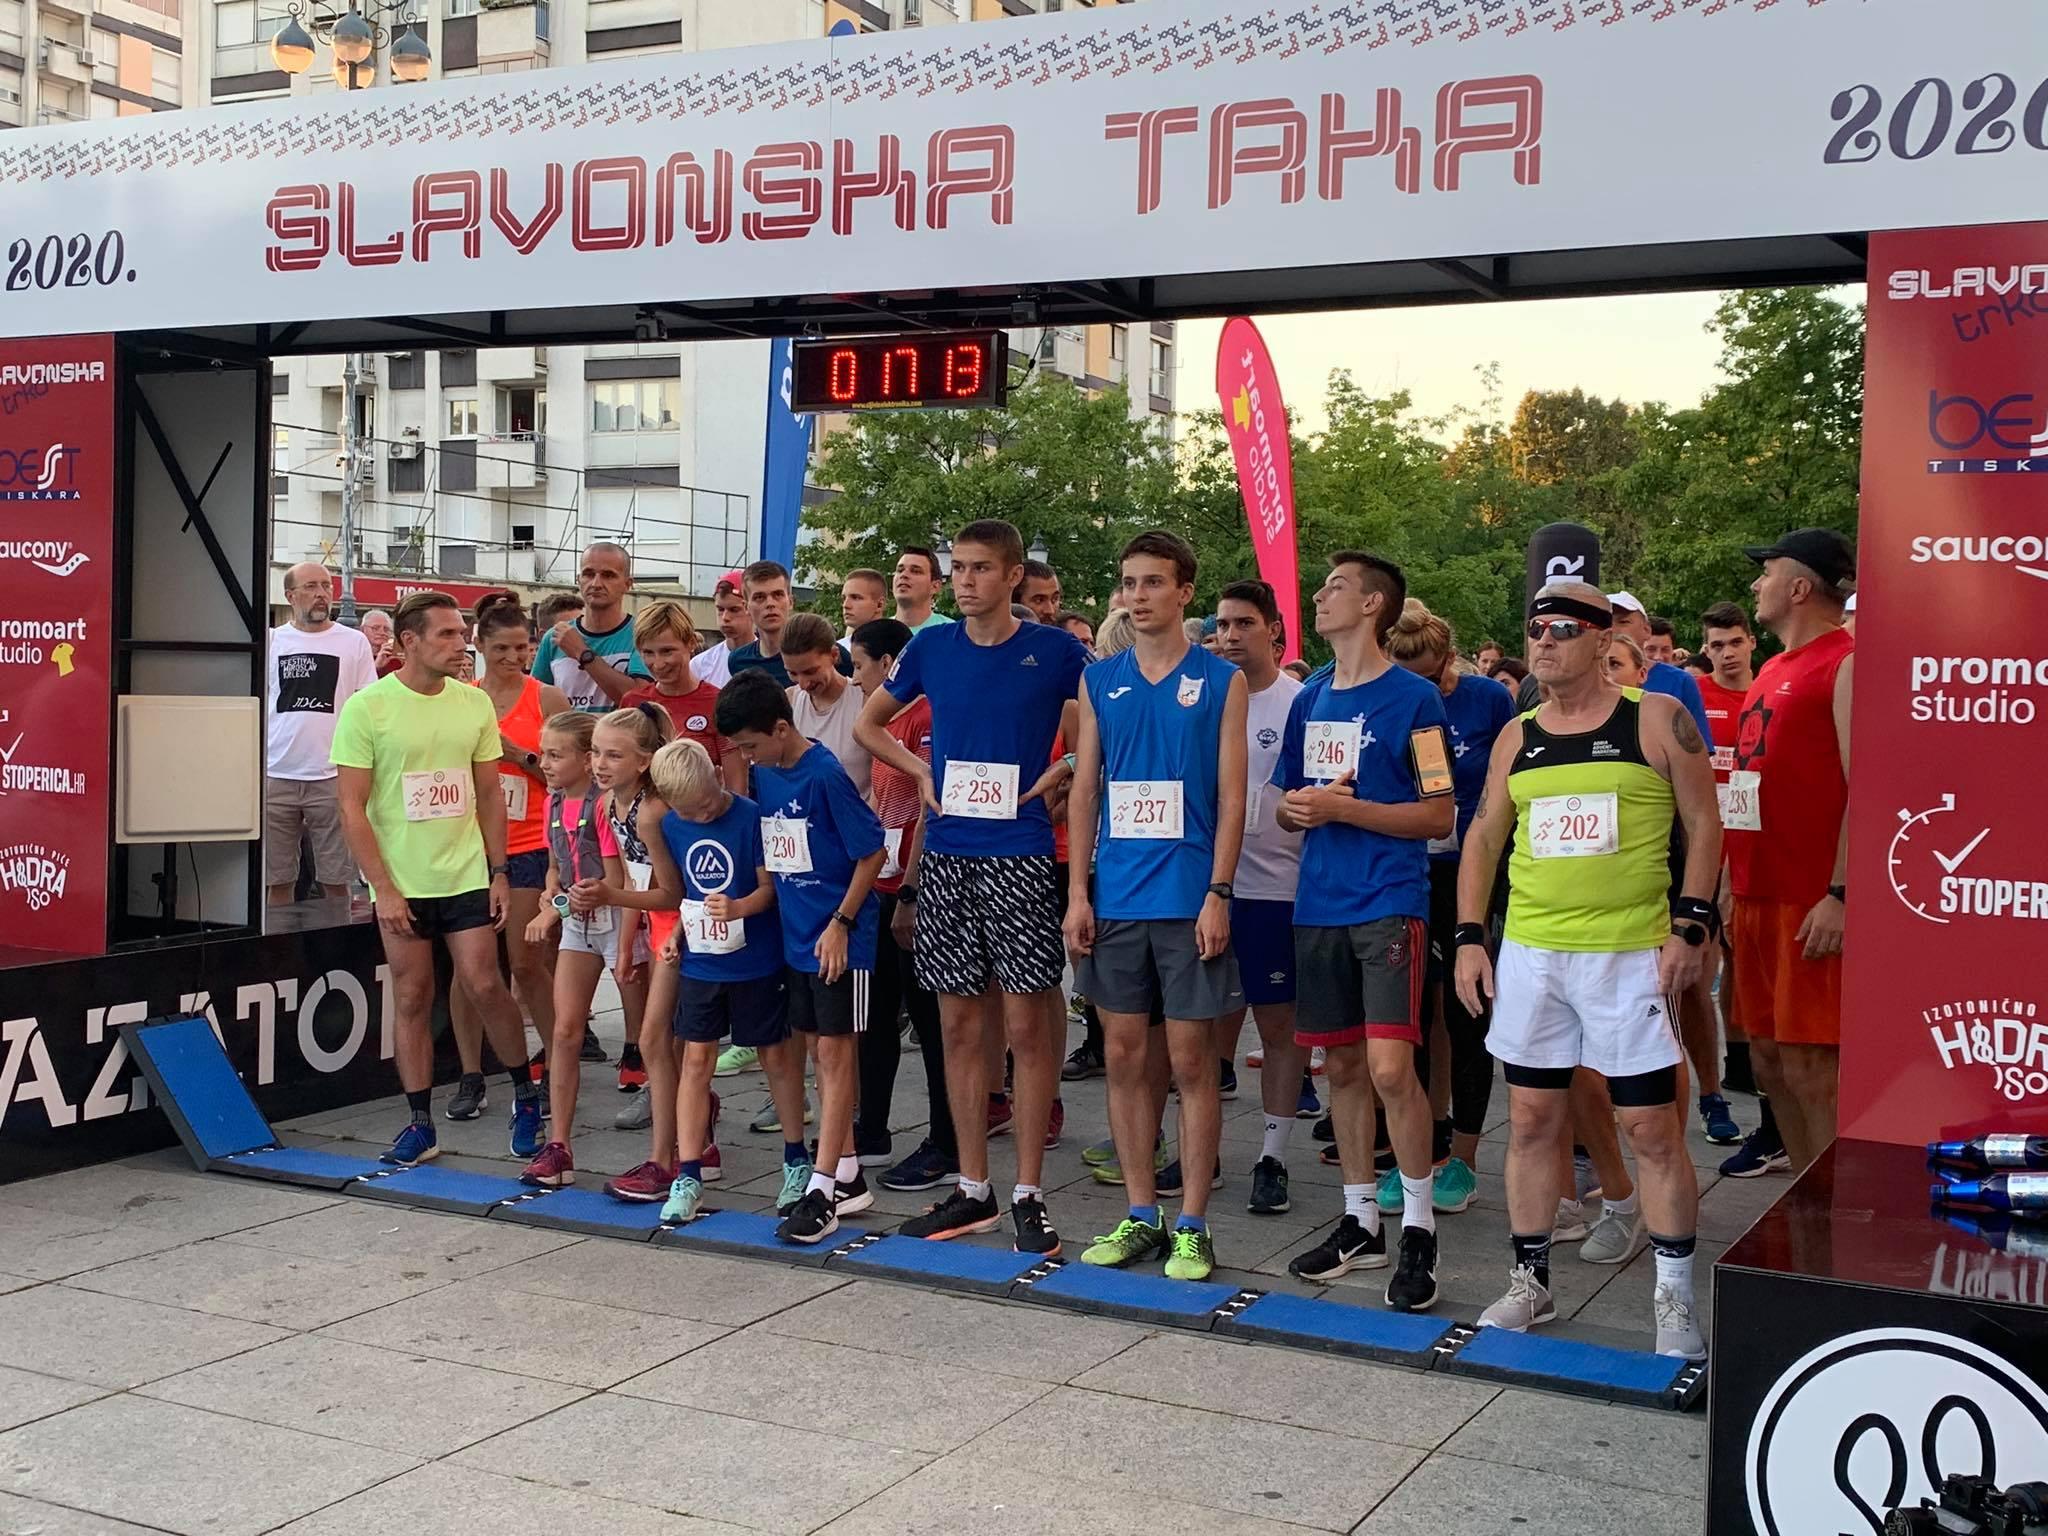 U Slavonskom Brodu jučer održana 3. Slavonska trka okupila je brojne zaljubljenike u trčanje, održan i prvi brodski noćni polumaraton